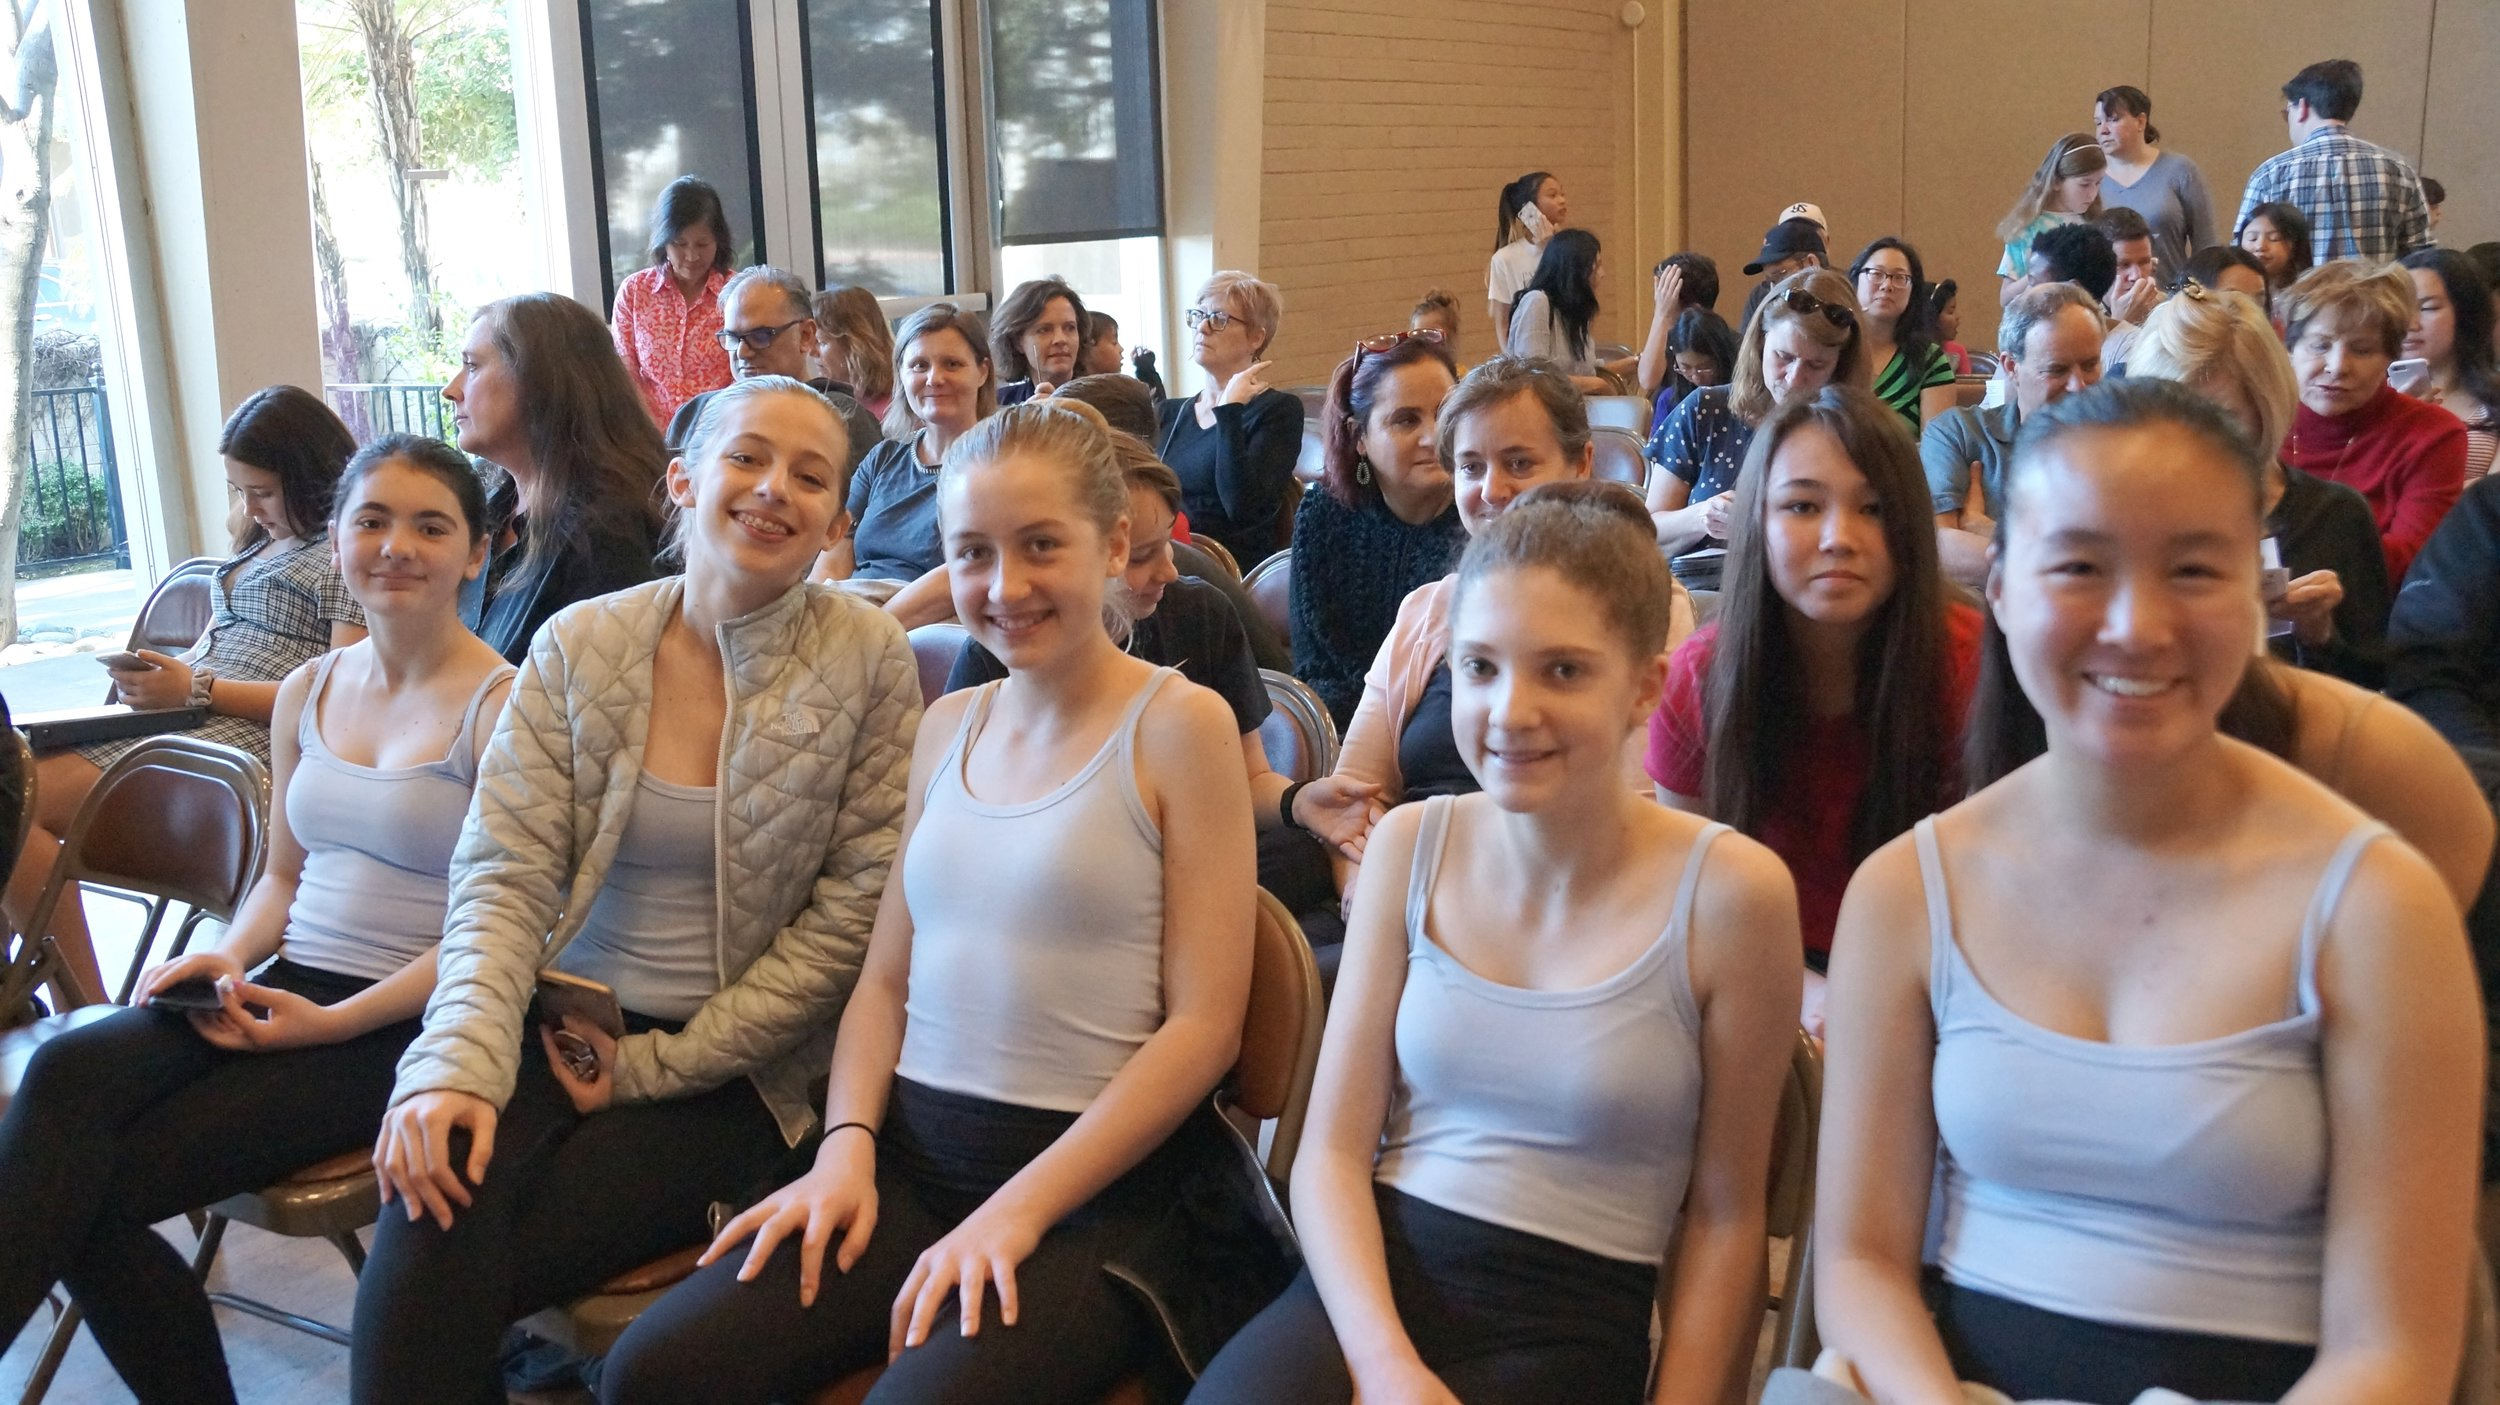 Sophie Eng, Caroline Collins, Sophia Hiestant, Maya Kumar, Cece Johnson, Maggie Sullivan, and Klaire Cherryhomes . Dance .